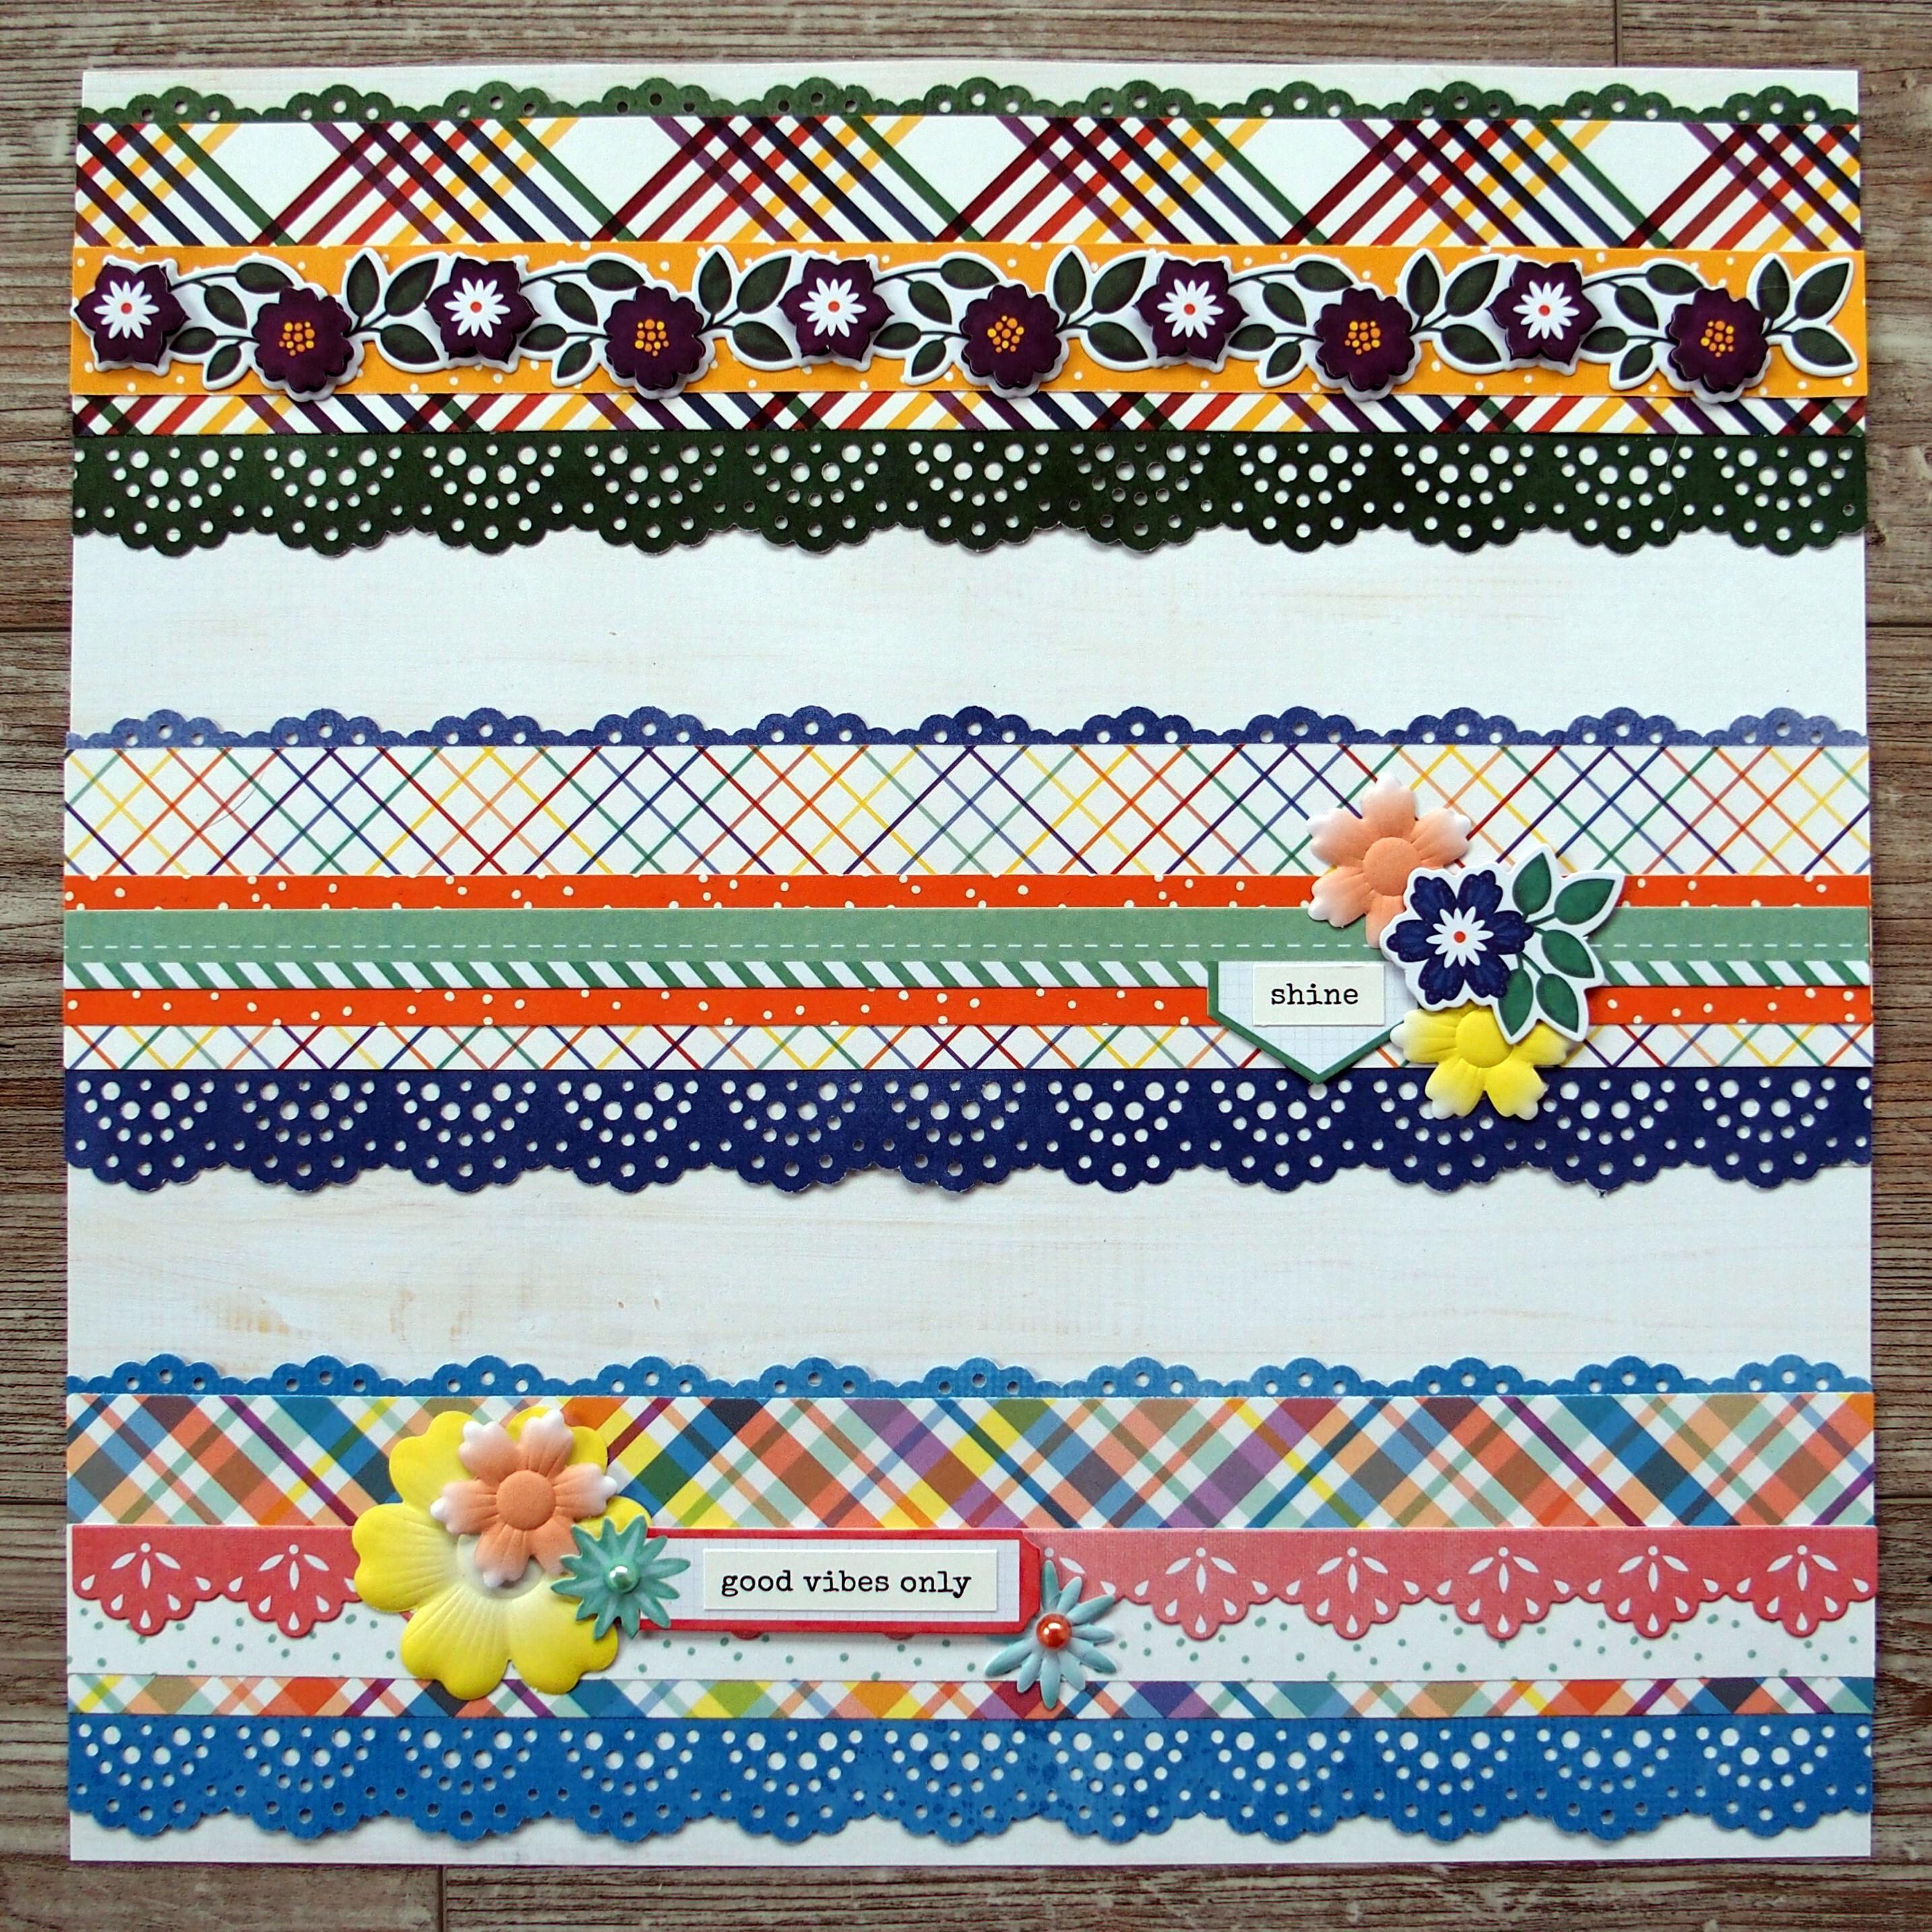 Rainbow-Rush-Collection-Scrapbooking-Borders-Creative-Memories-9